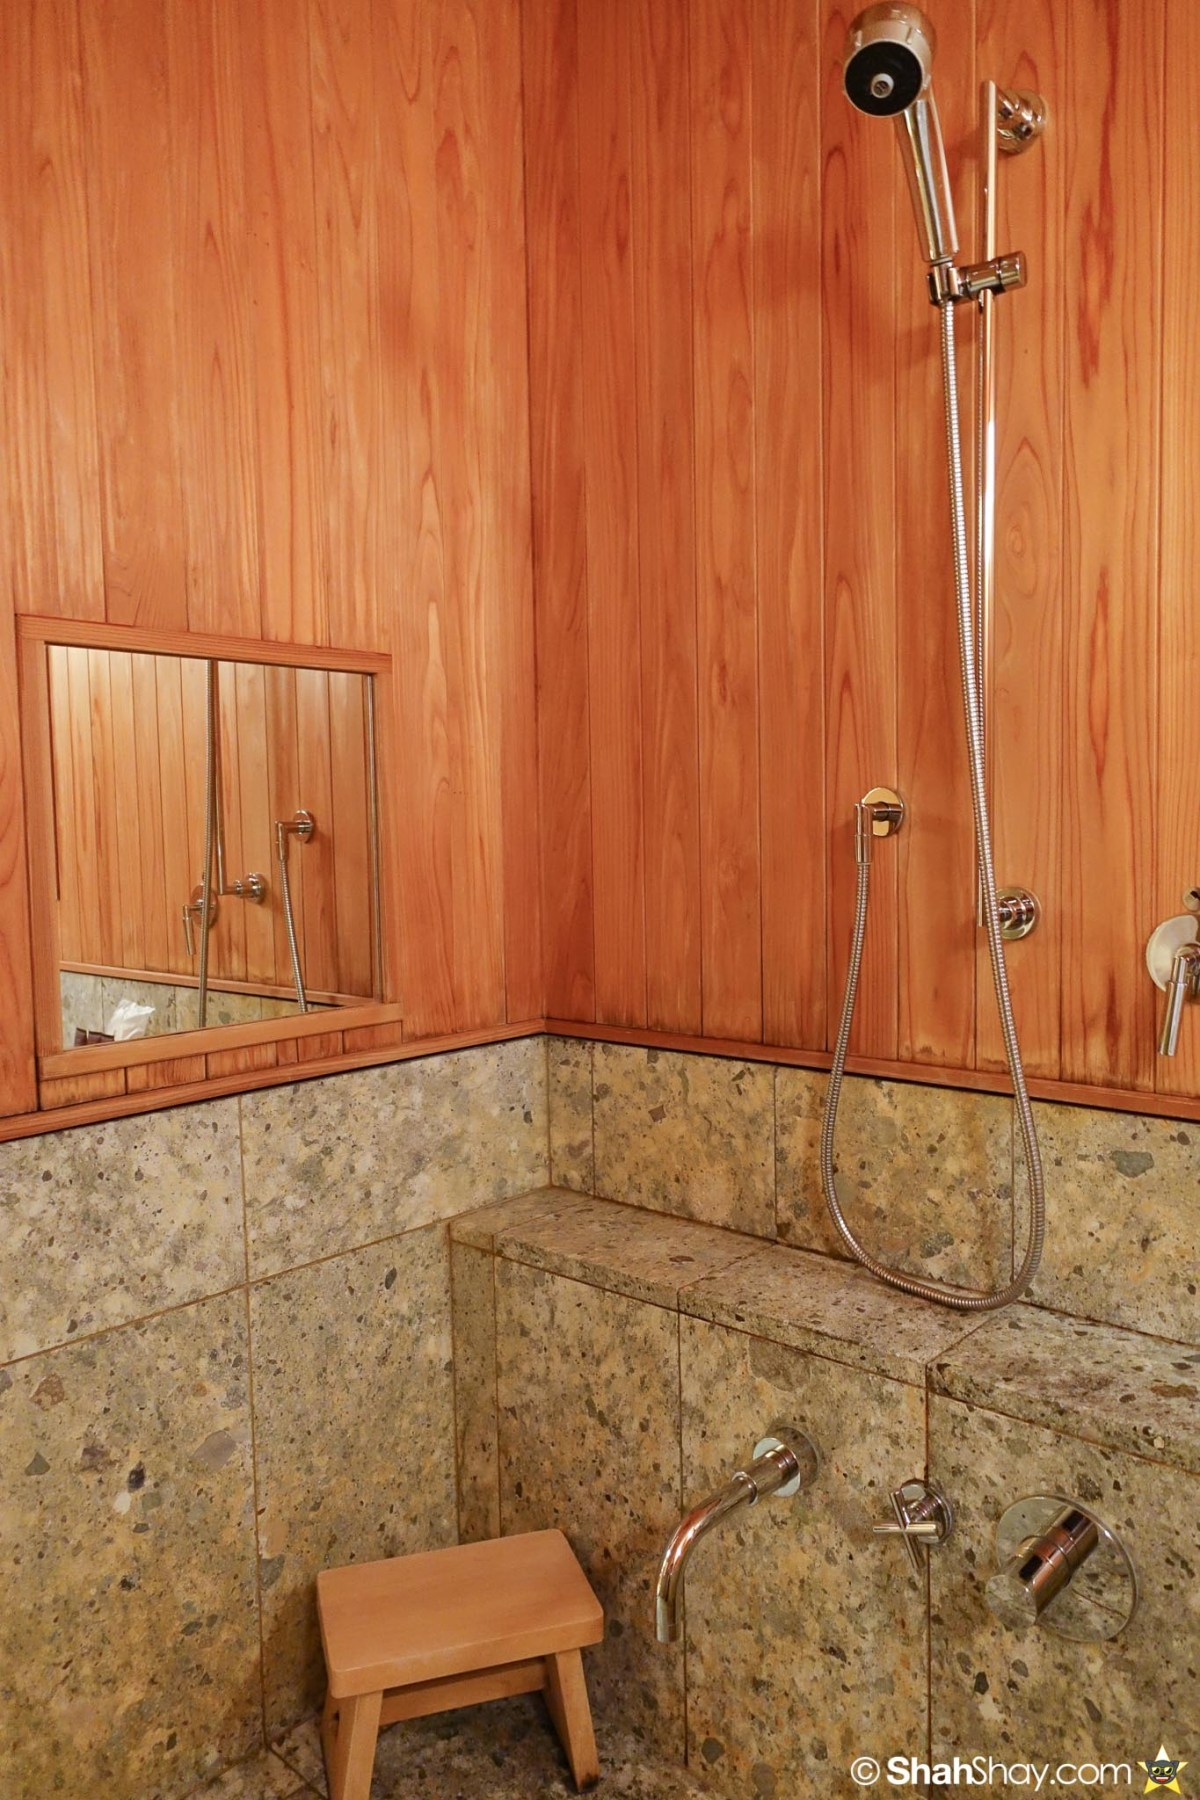 The Ritz-Carlton Tokyo Rooms - Modern Japanese Suite - Bathroom Shower